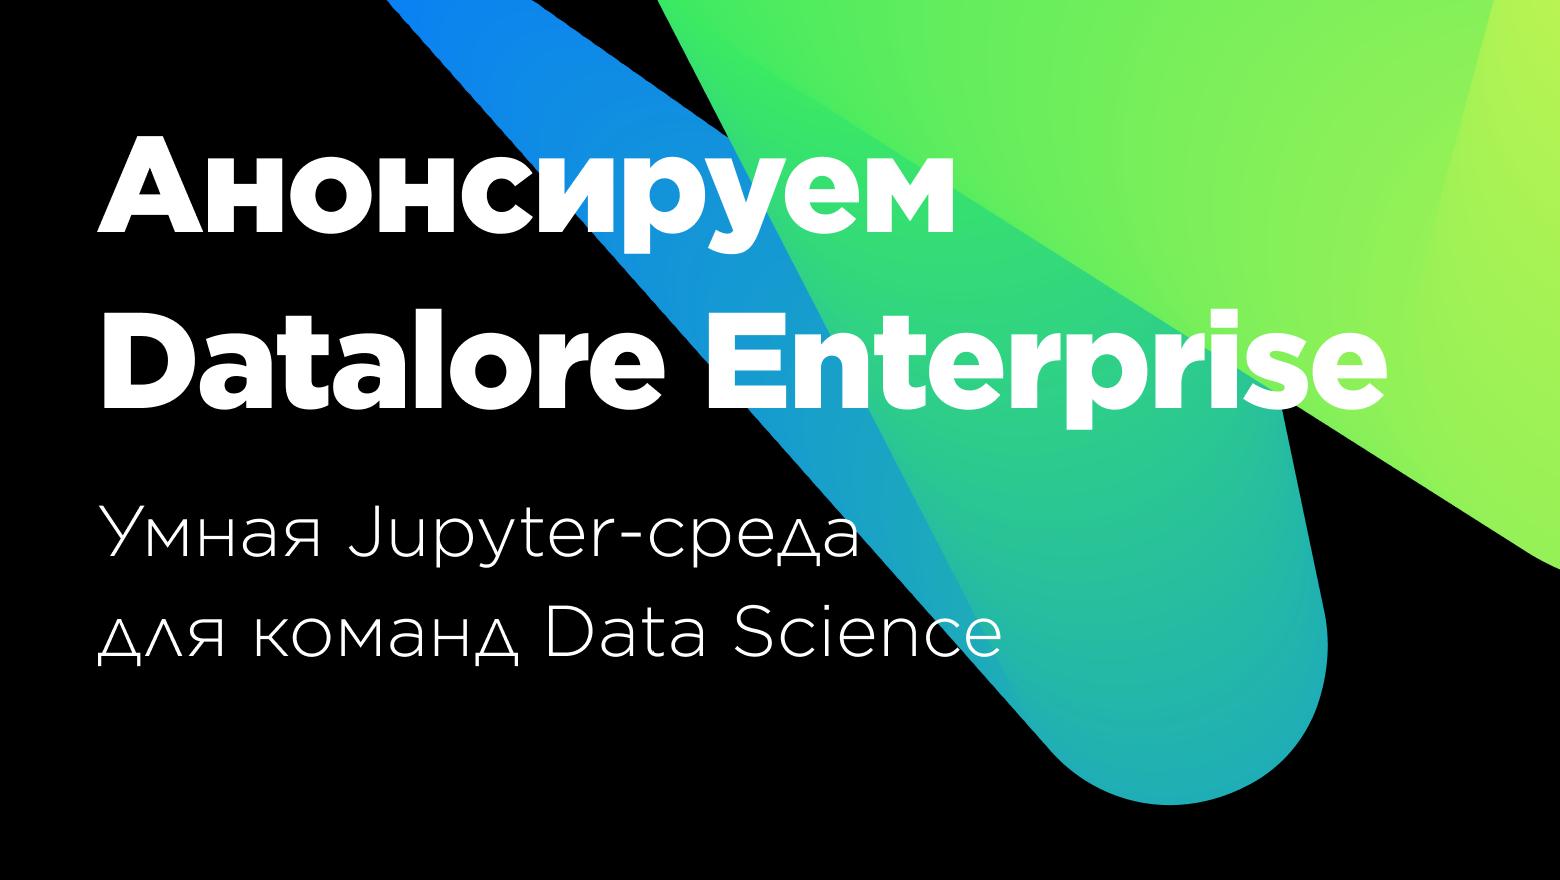 Аннонсируем Datalore Enterprise - Умная Jupyter-среда для команд Data Science